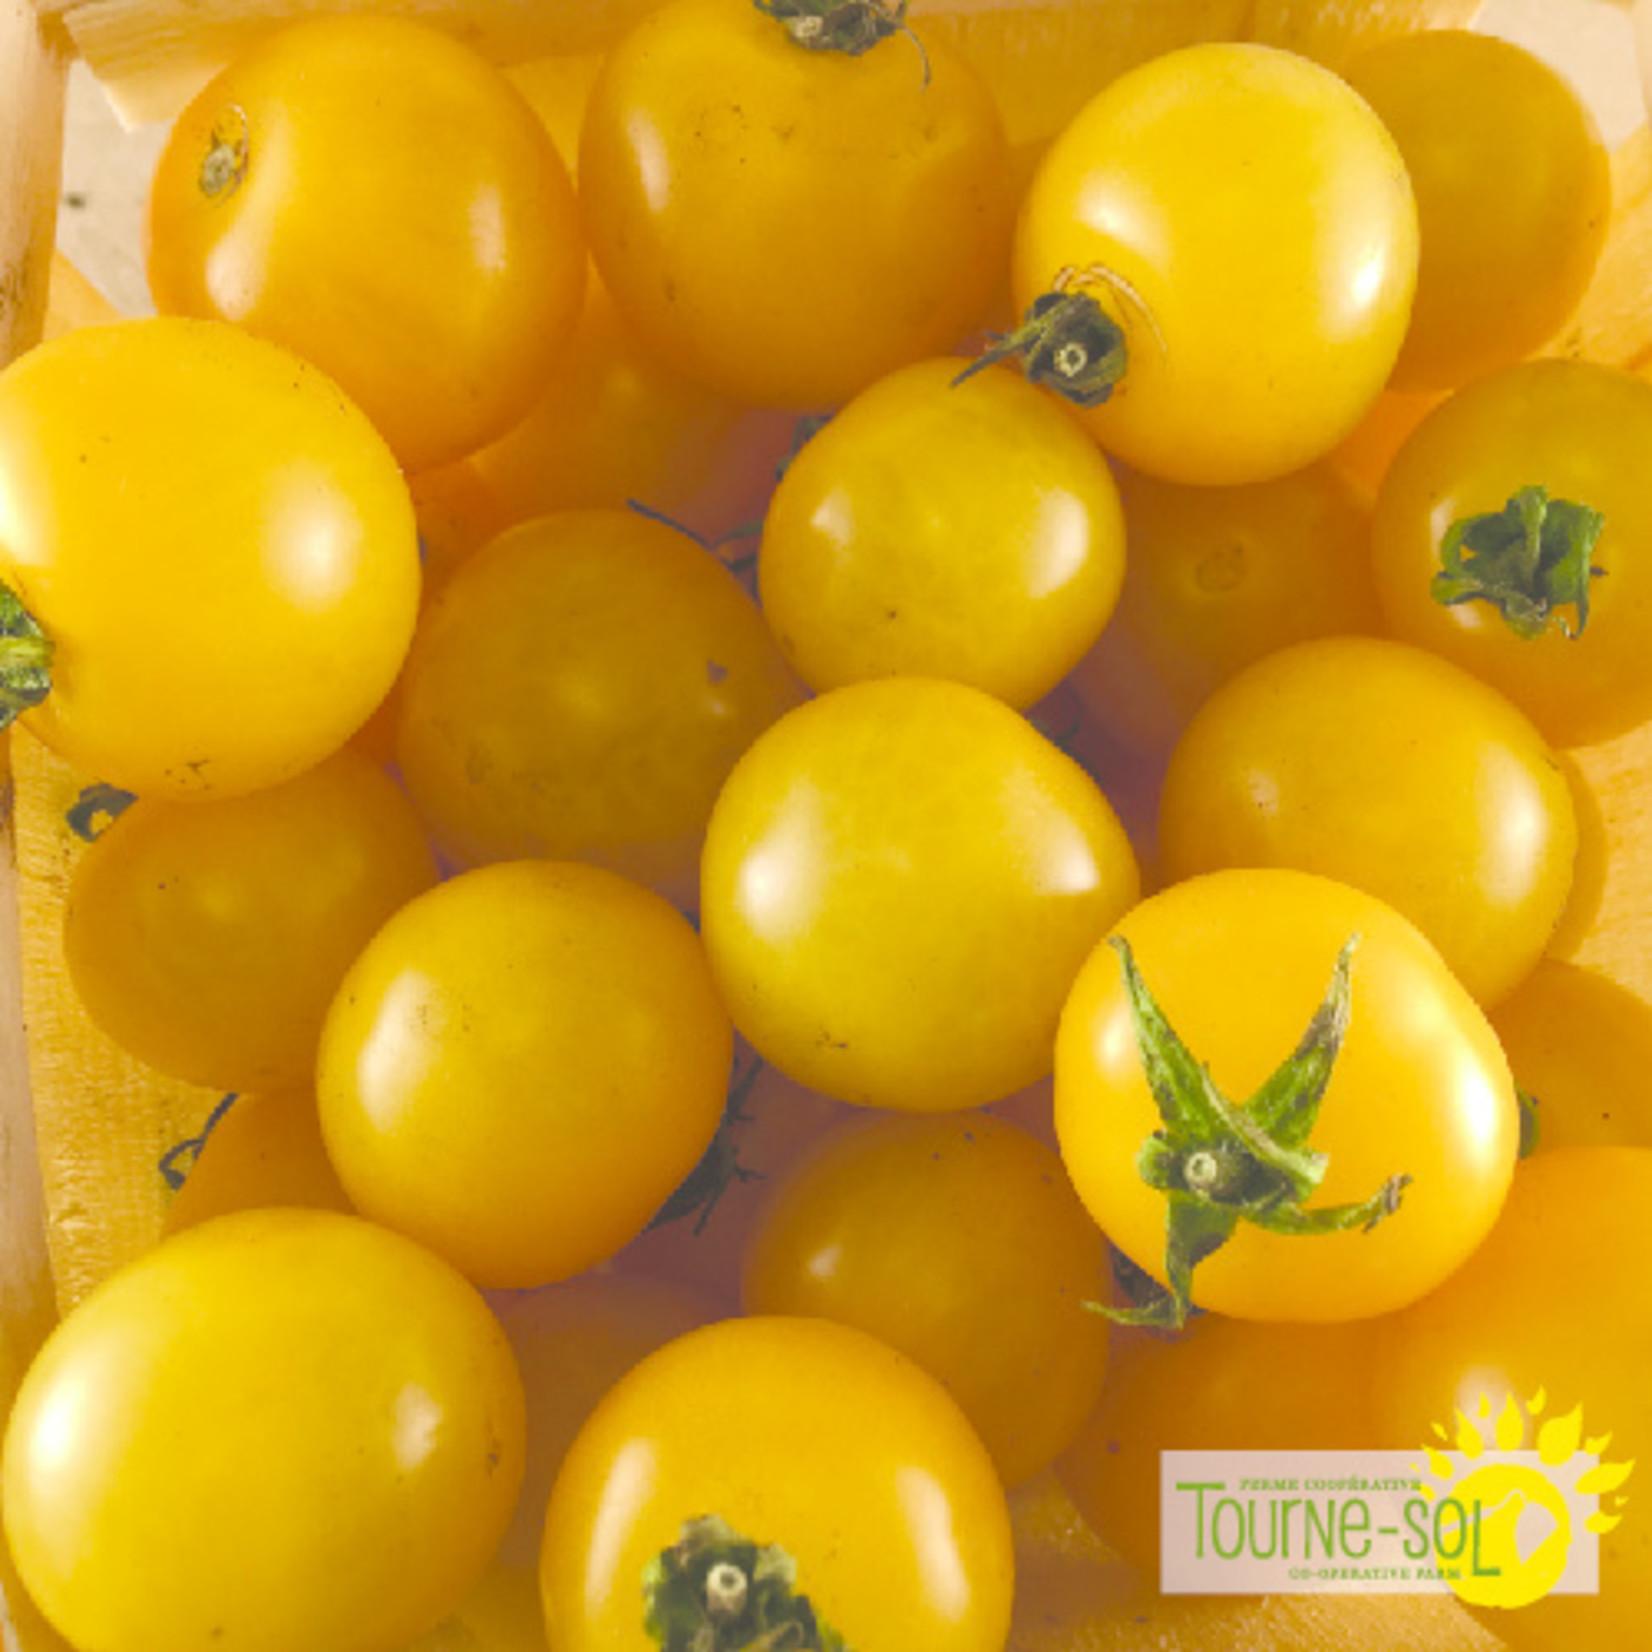 Tourne-Sol Tomate Jaune Cerise Galina